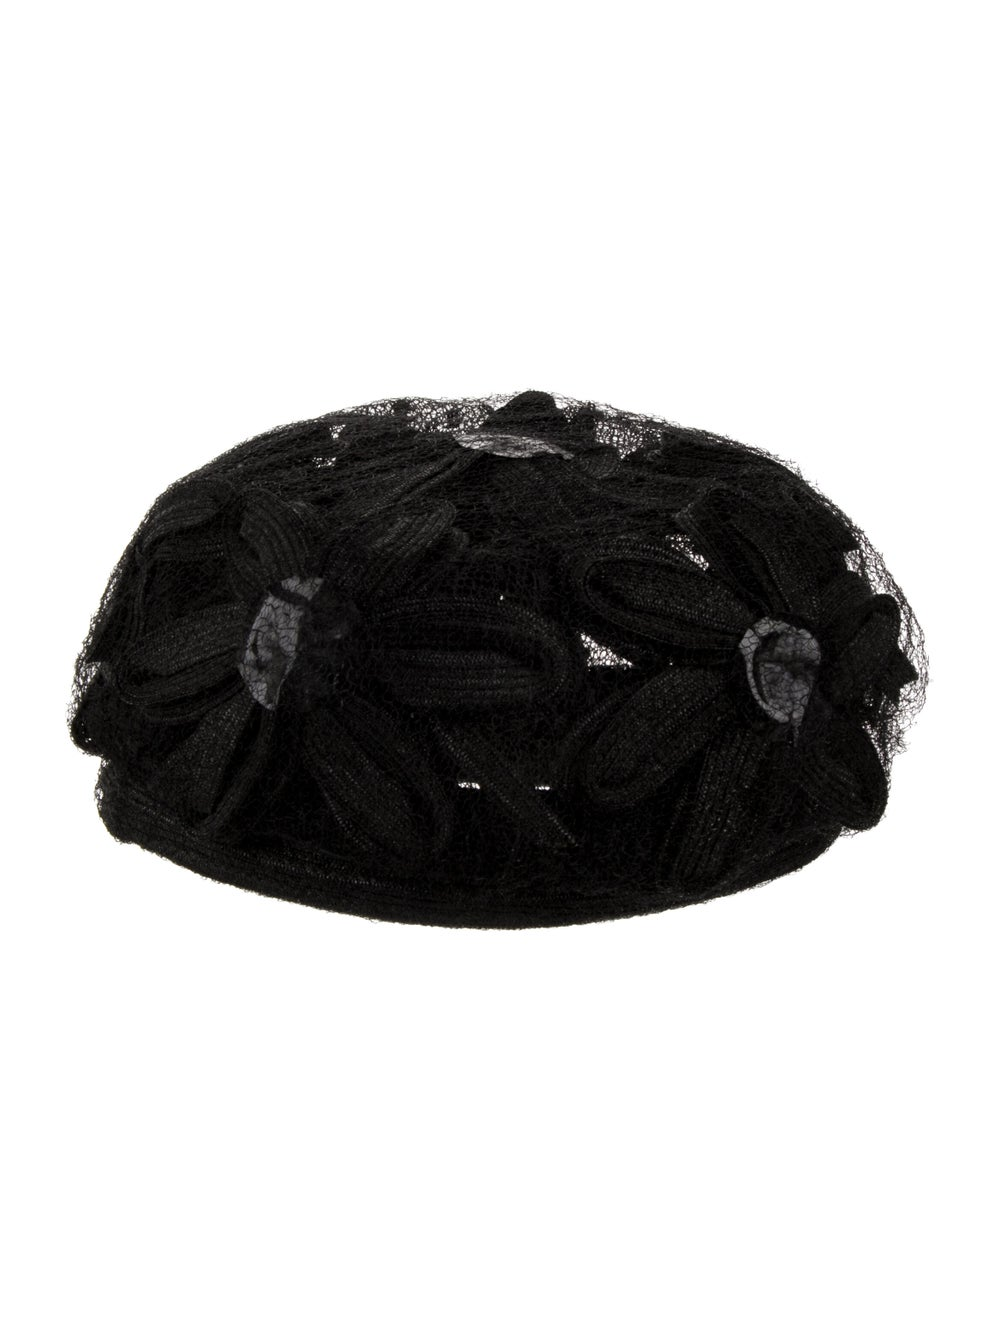 Christian Dior Lace Hat Black - image 2